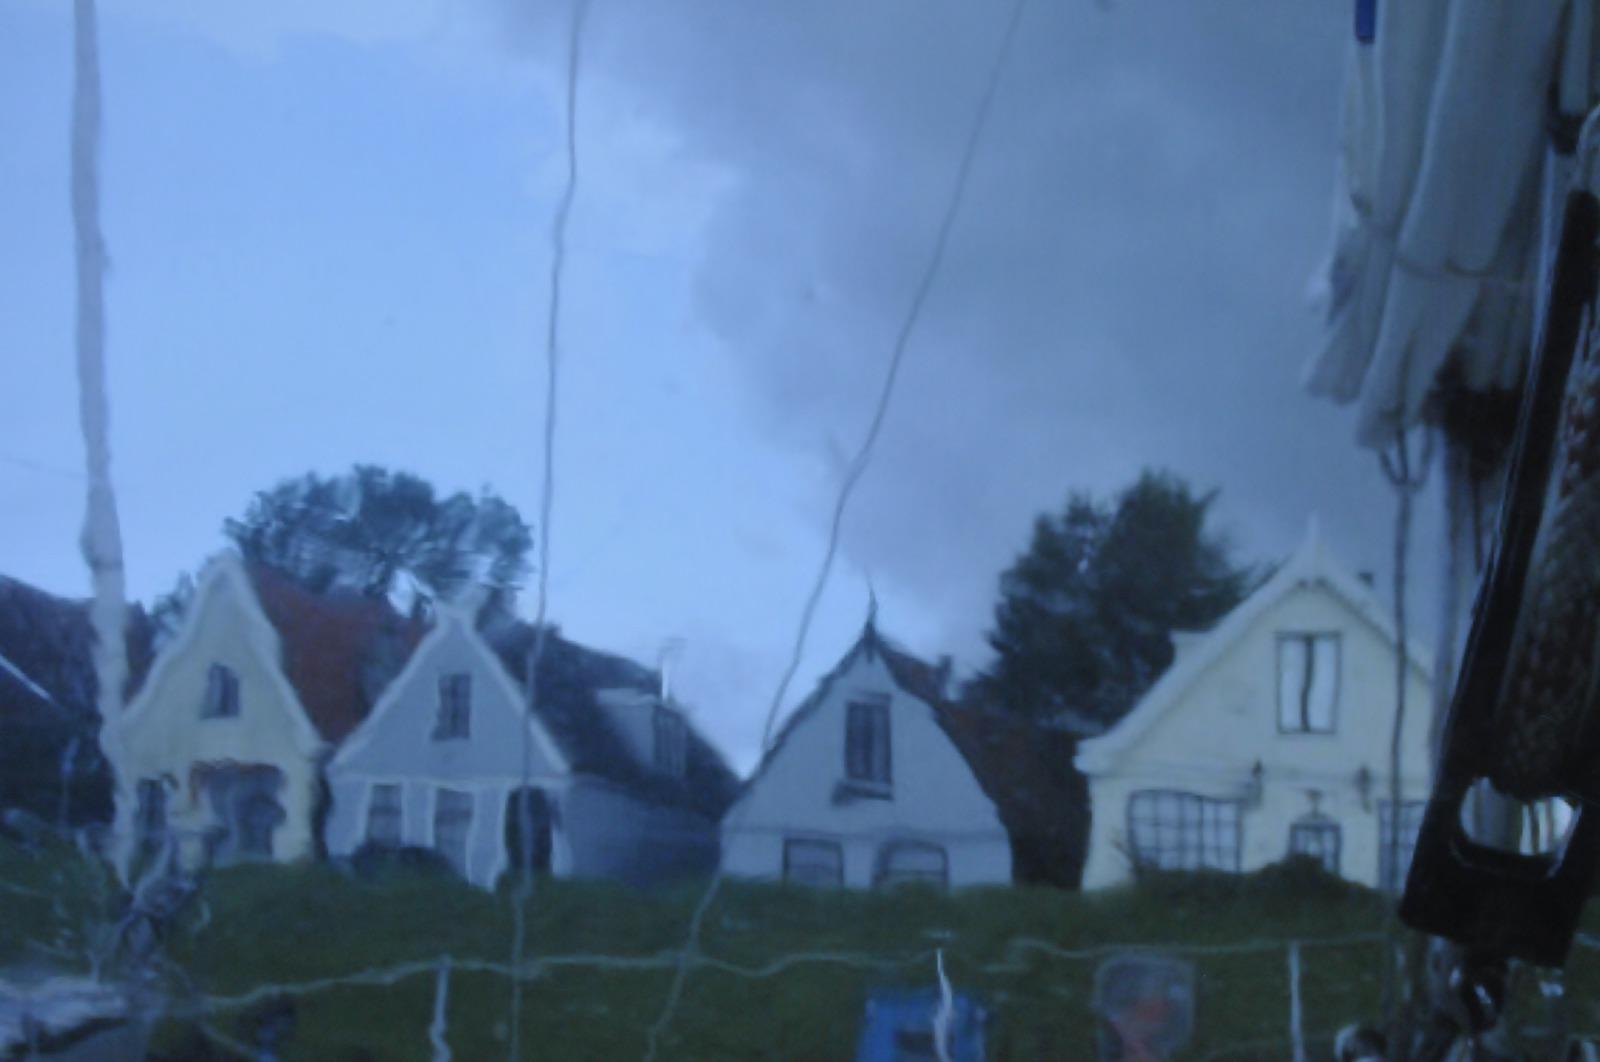 Onweersbui boven Durgerdam